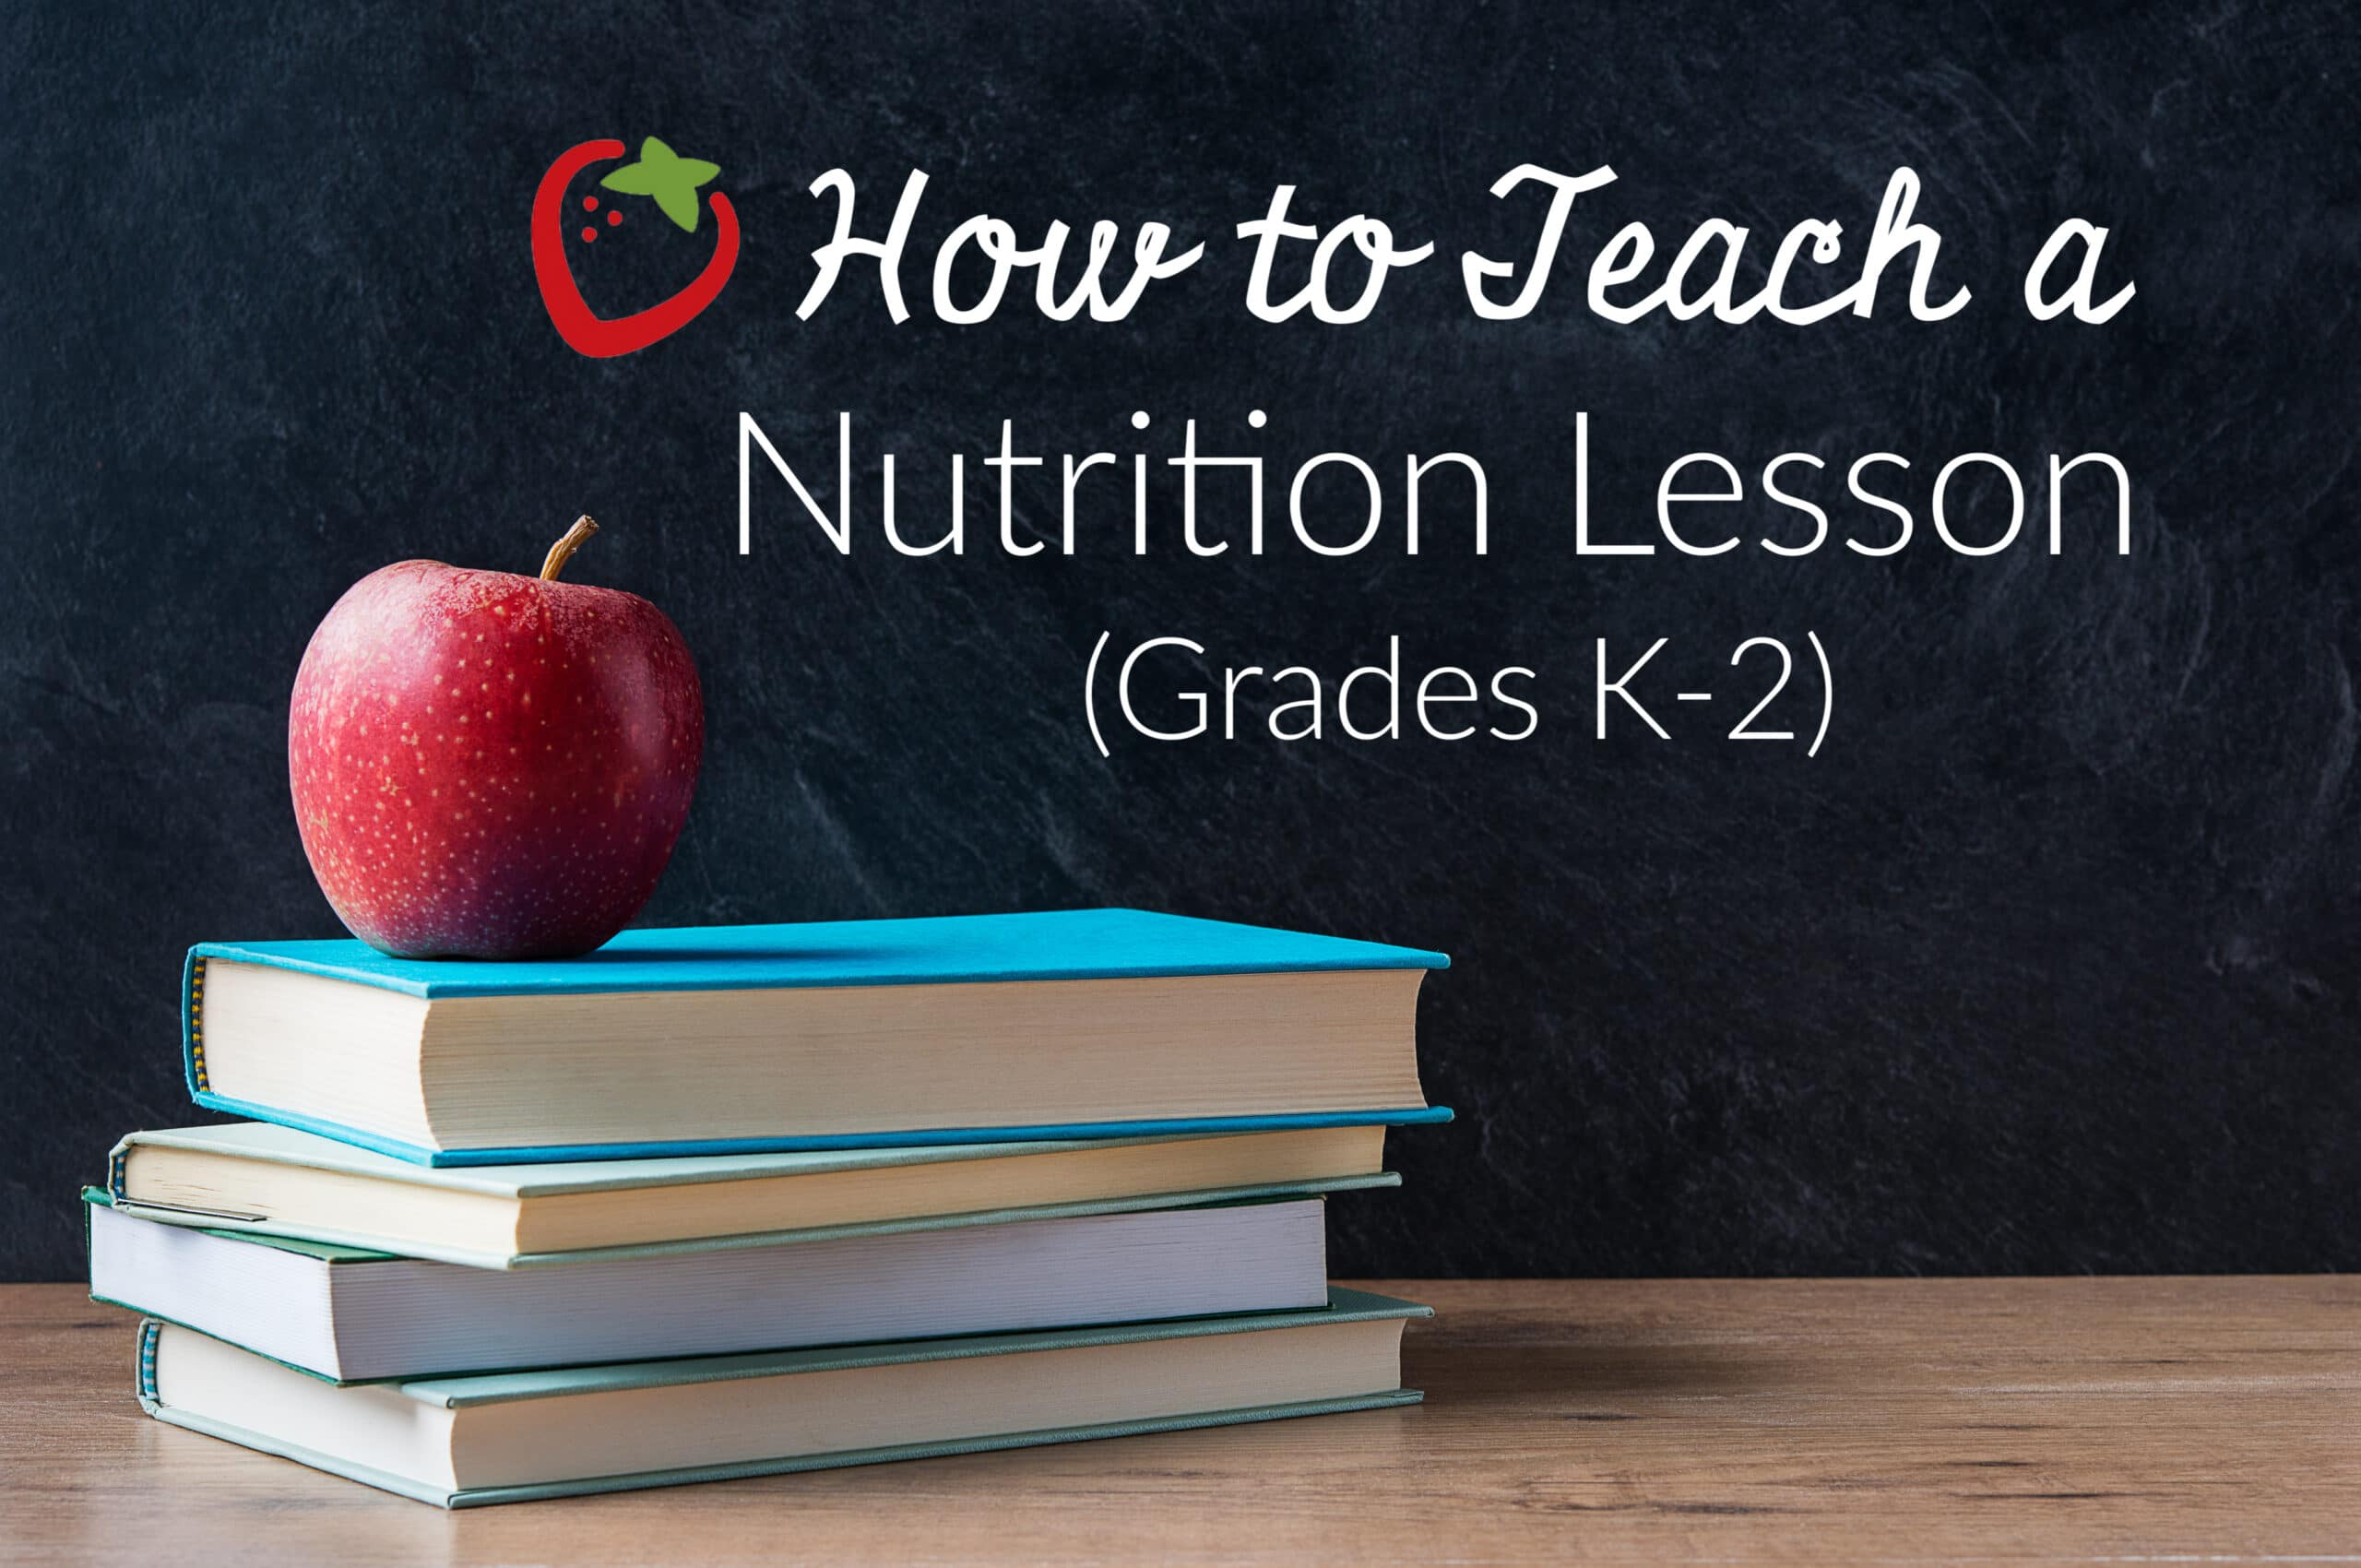 How to Teach a Nutrition Lesson (Grades K-2) - Super Healthy